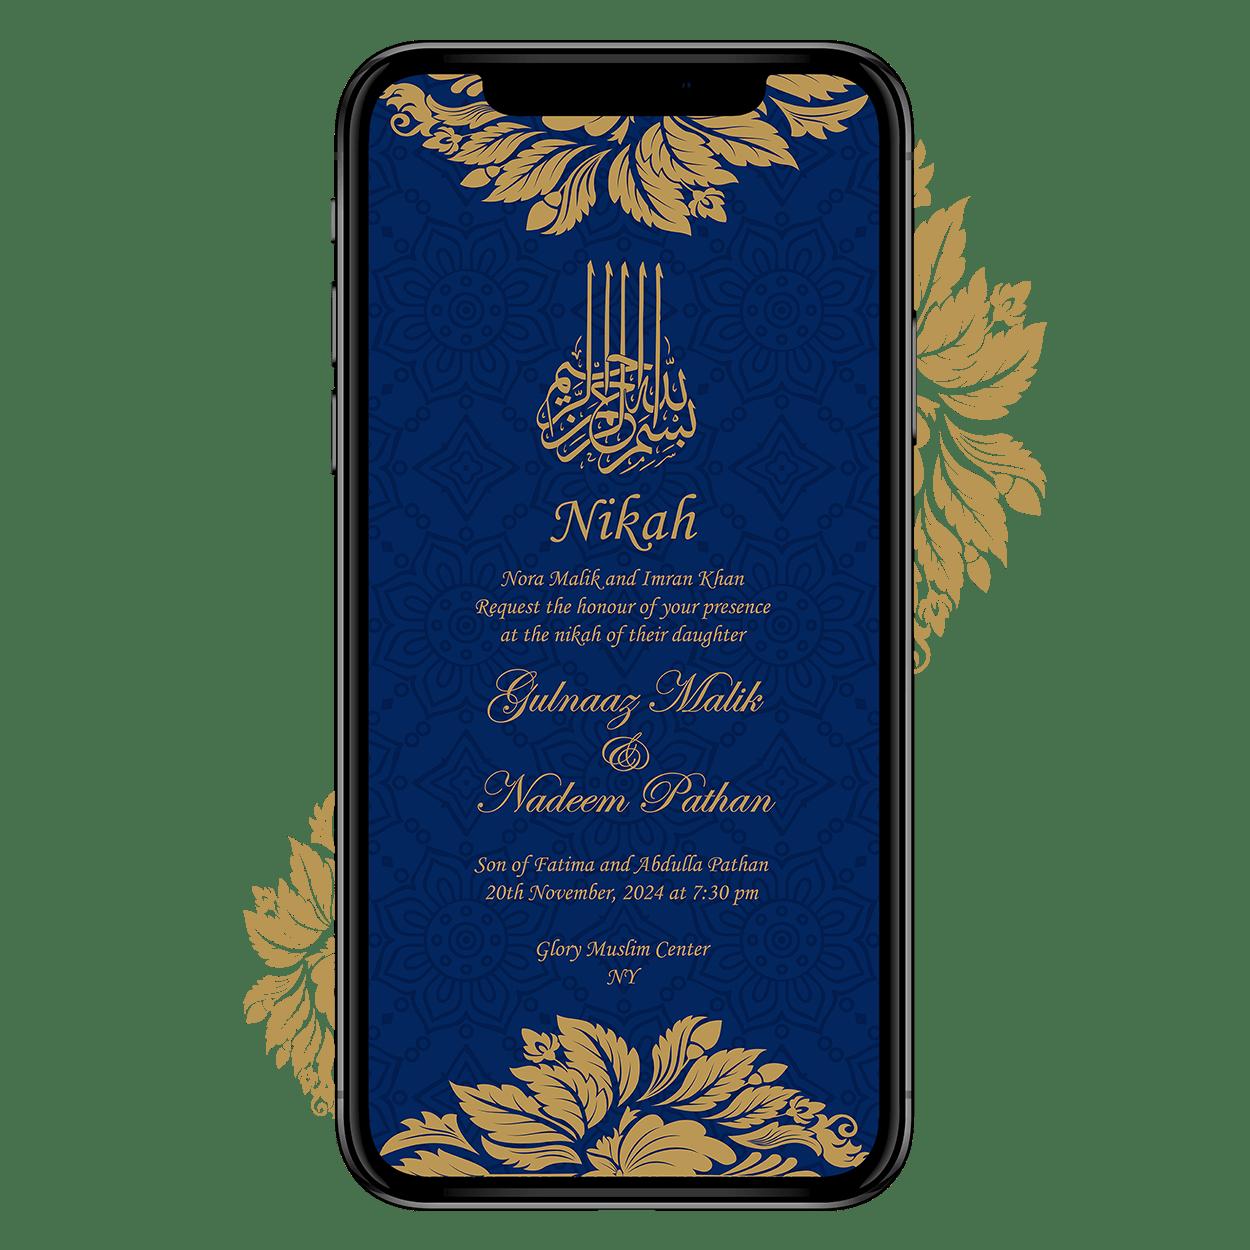 Invites Cafe Muslim Wedding Invitation 010